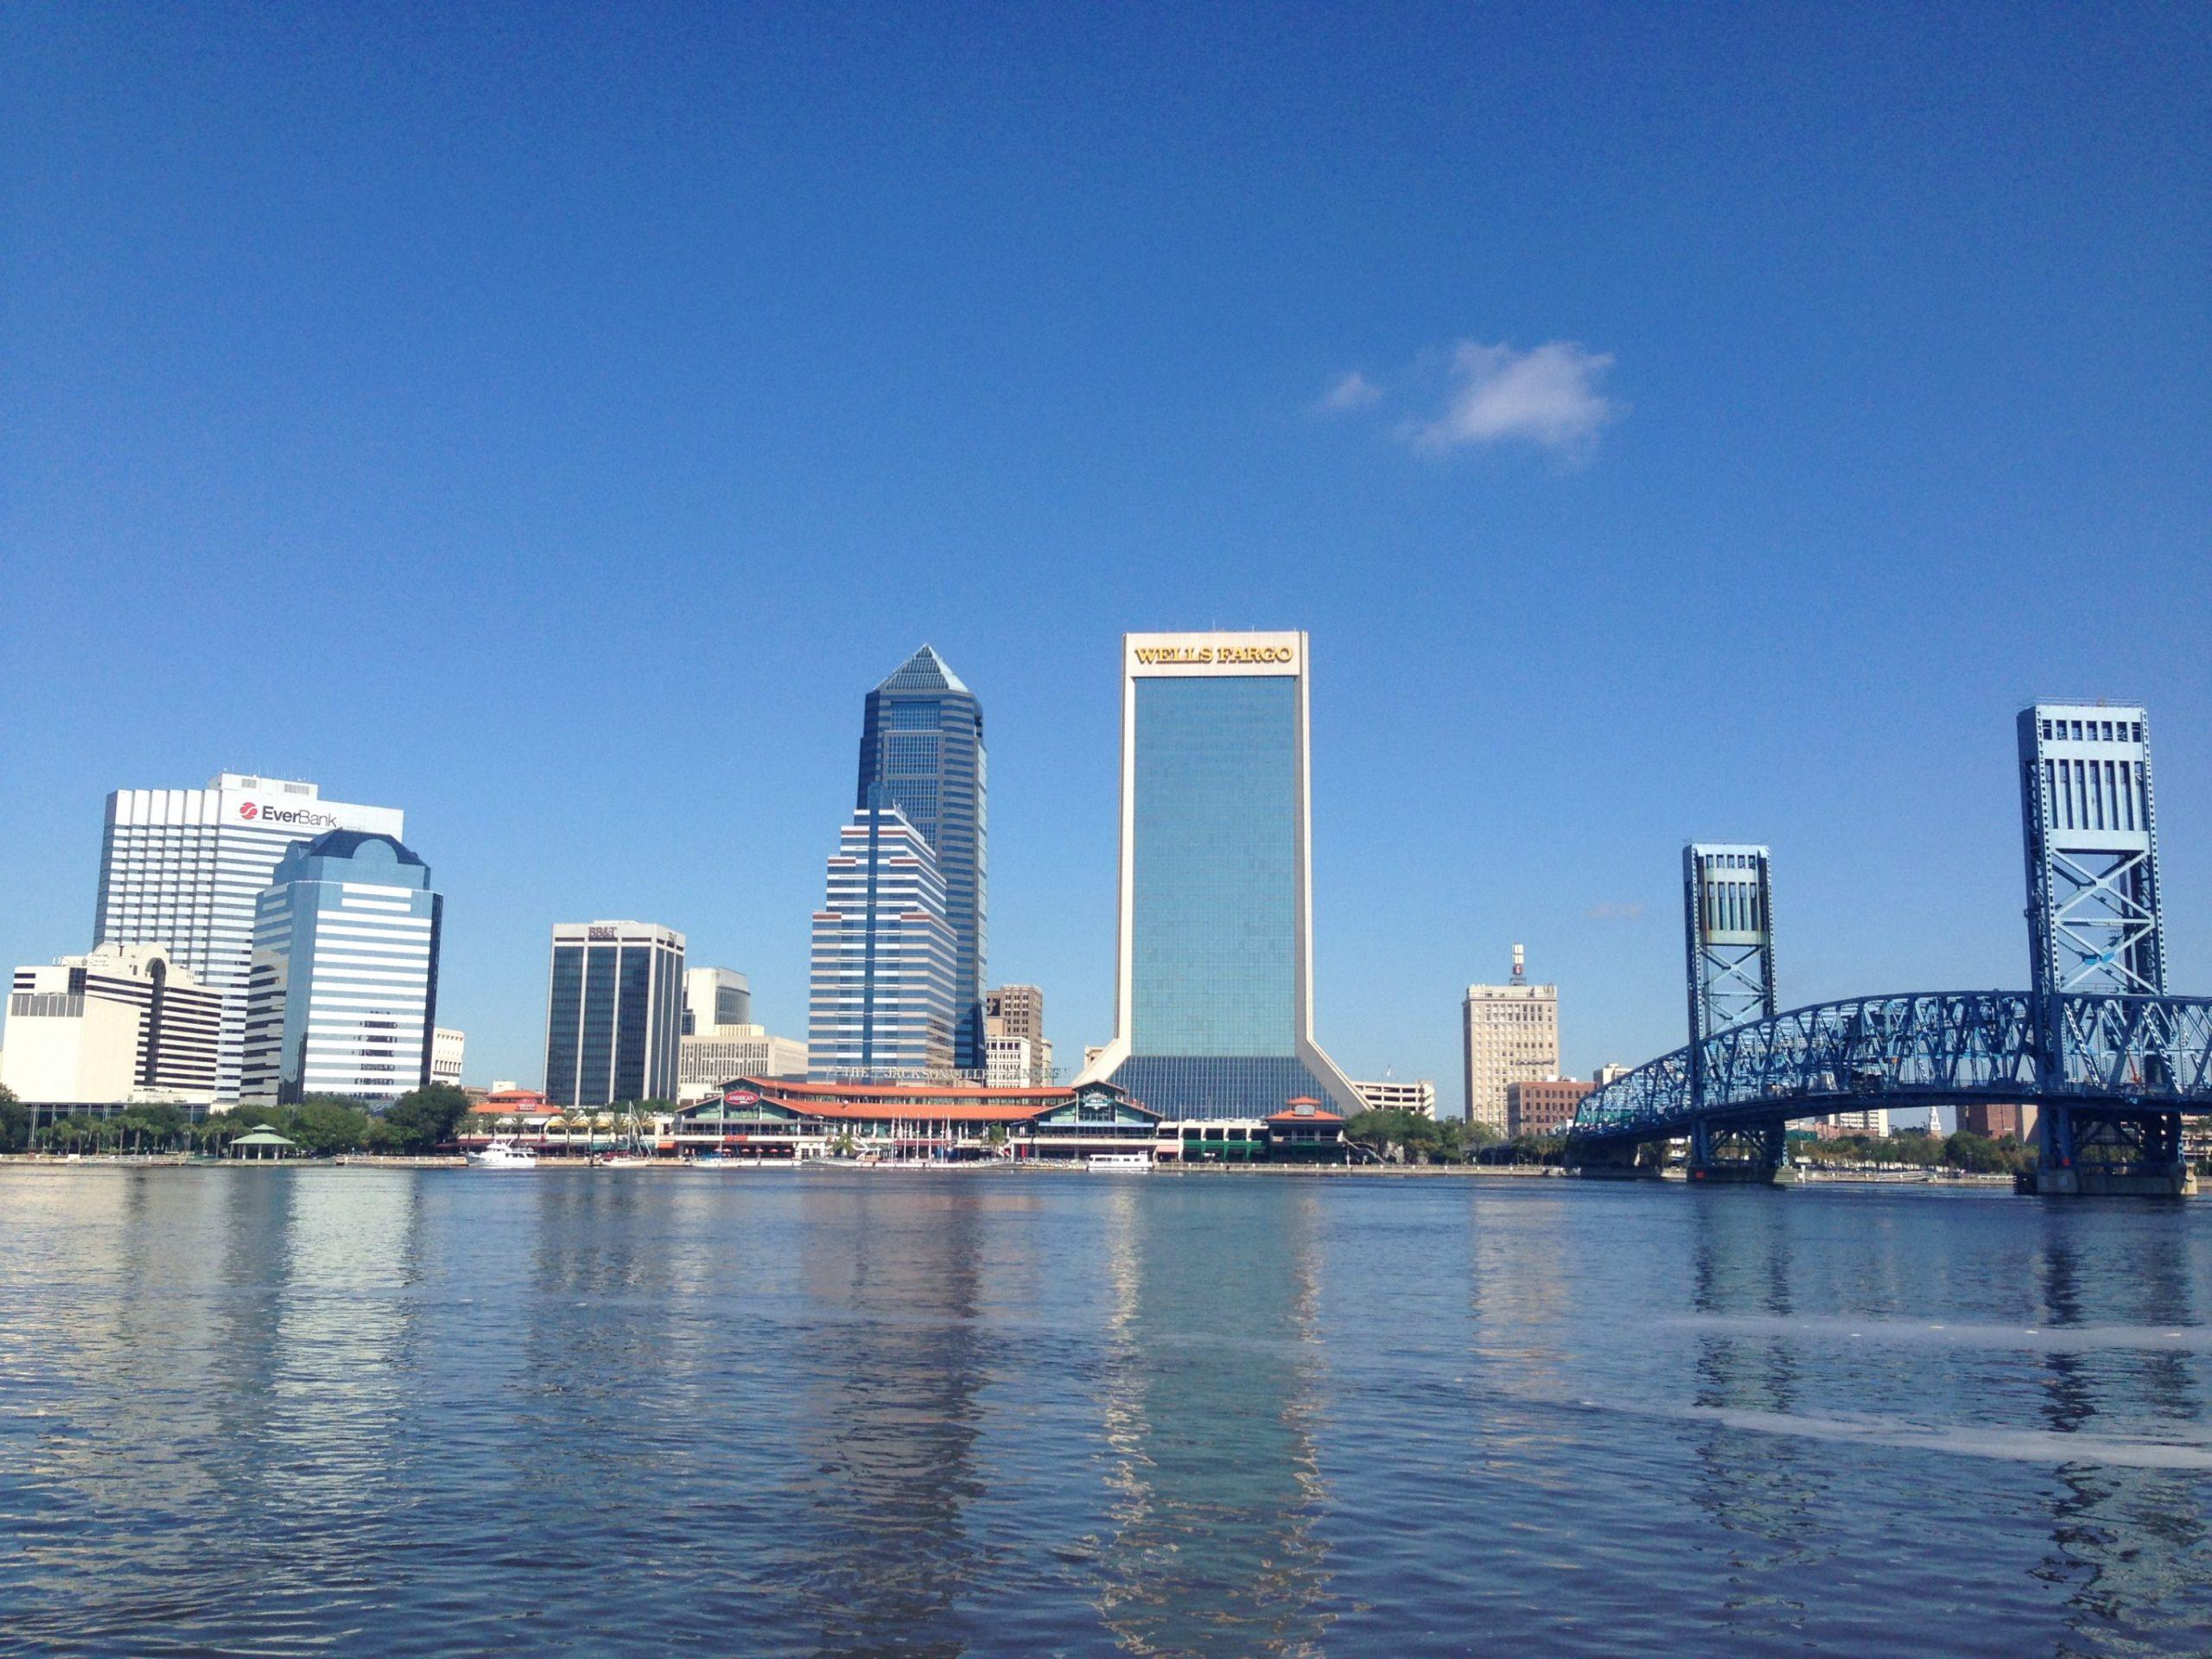 Days 144-145: Georgia & Florida